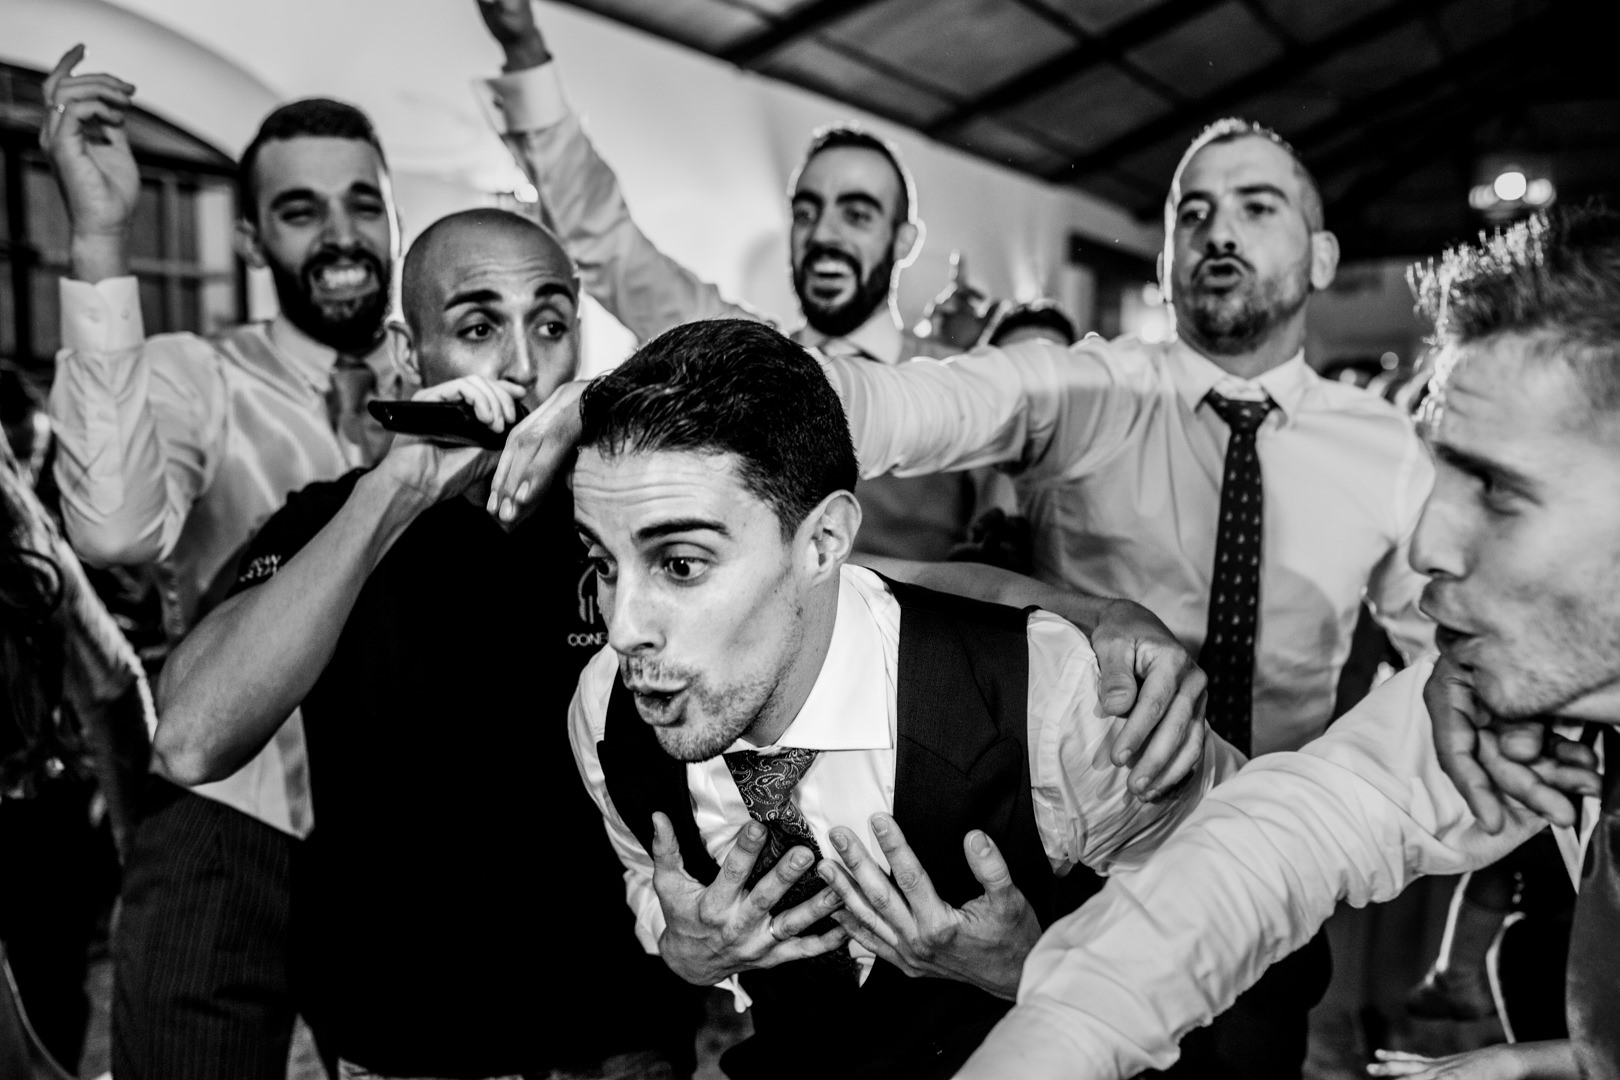 Boda-sevilla-Wedding-engagement-Rafael-Torres-fotografo-bodas-sevilla-madrid-barcelona-wedding-photographer--80.jpg